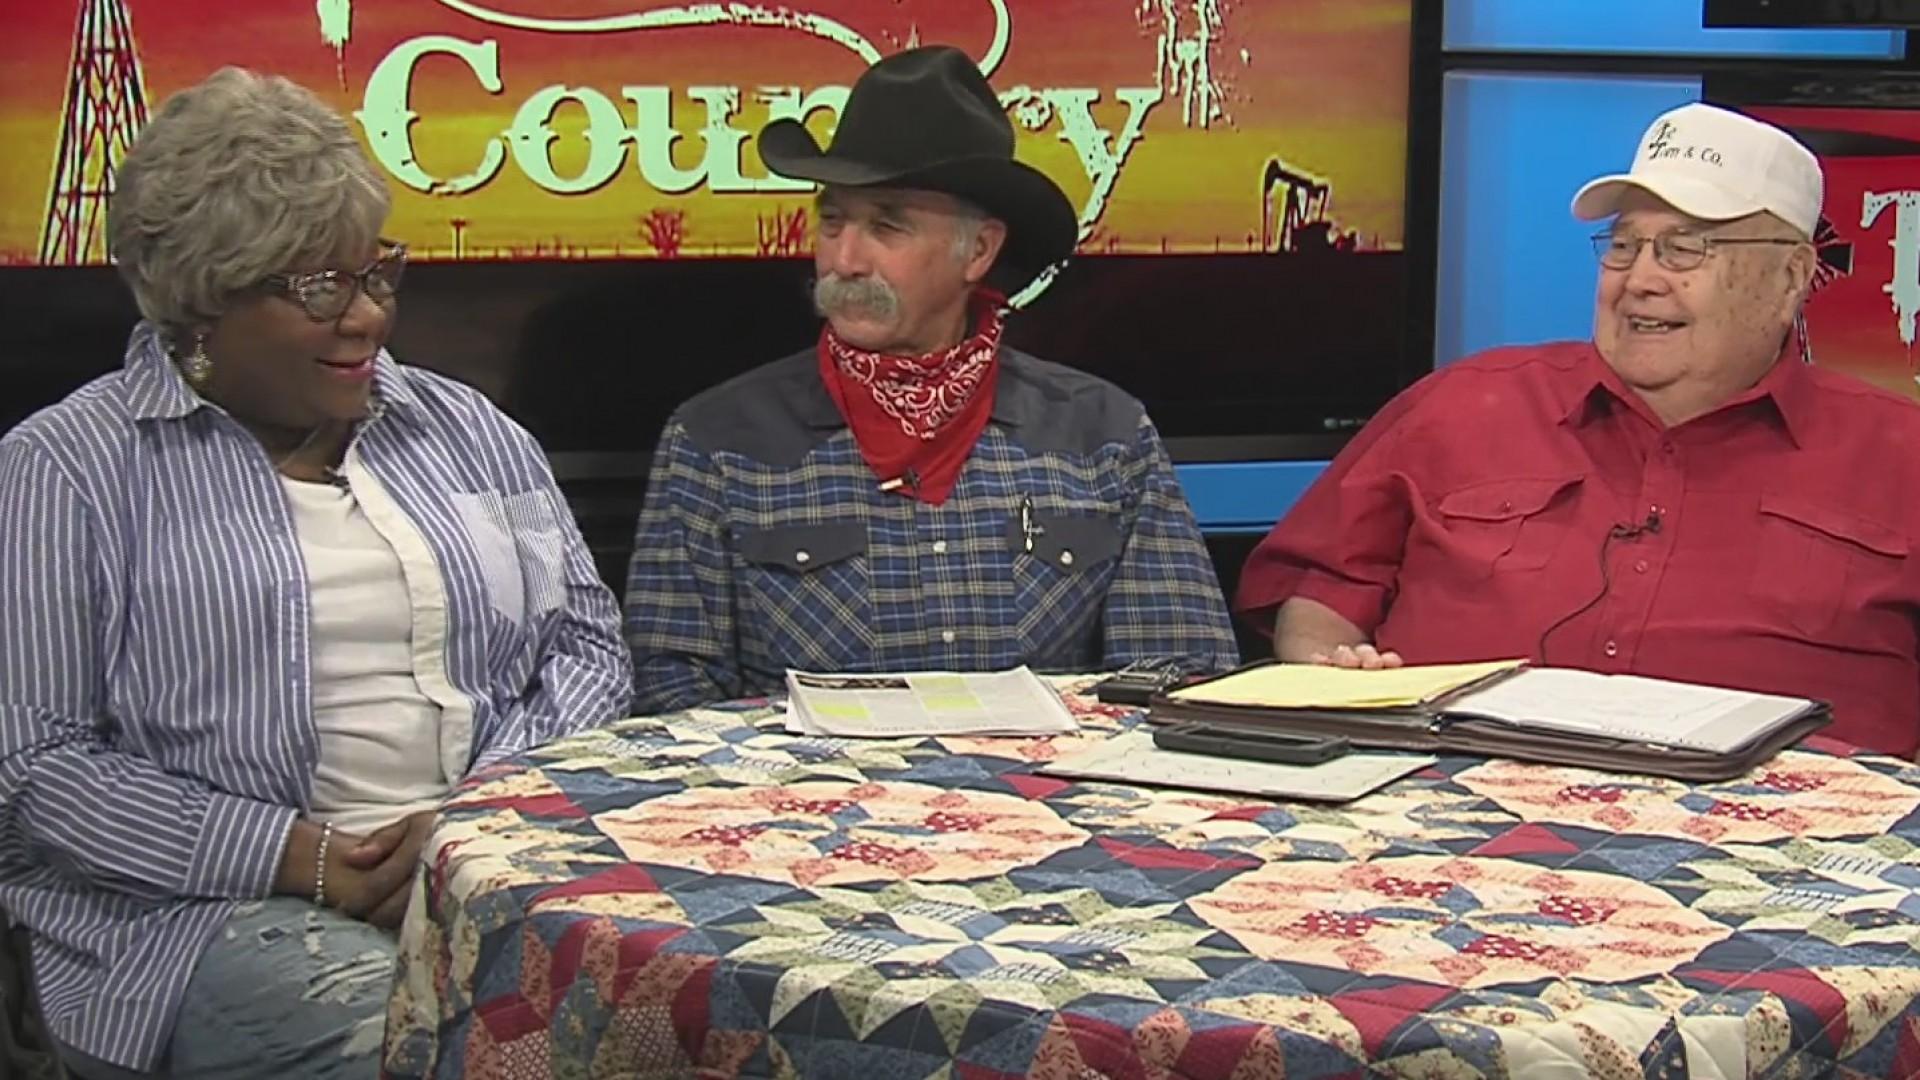 Texoma Country Morning 11/12/18 3